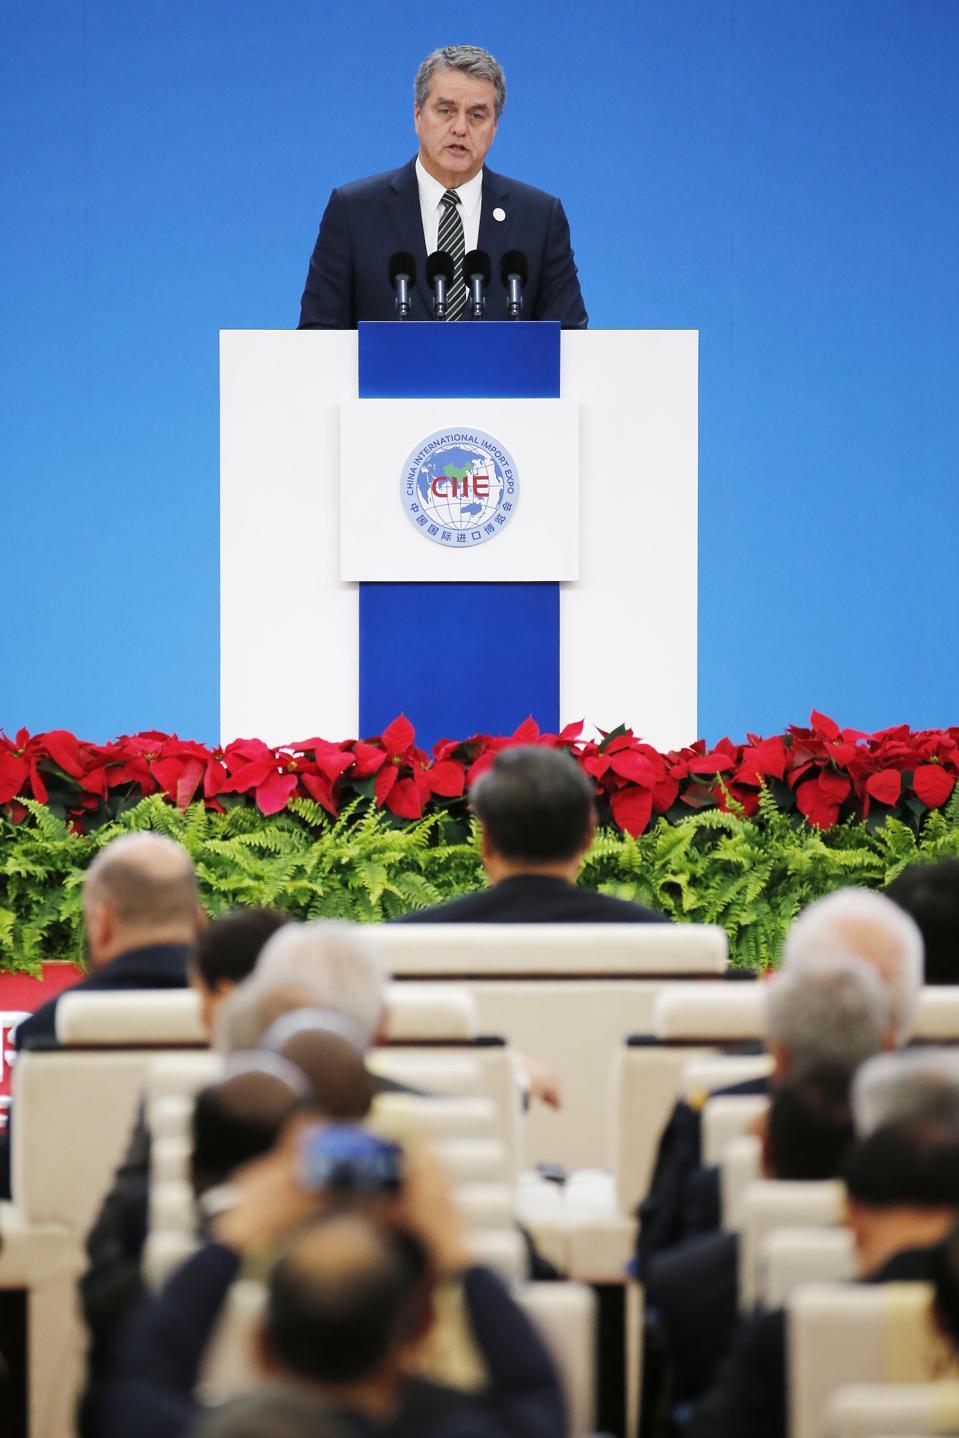 China International Import Expo (CIIE) - Opening Ceremony